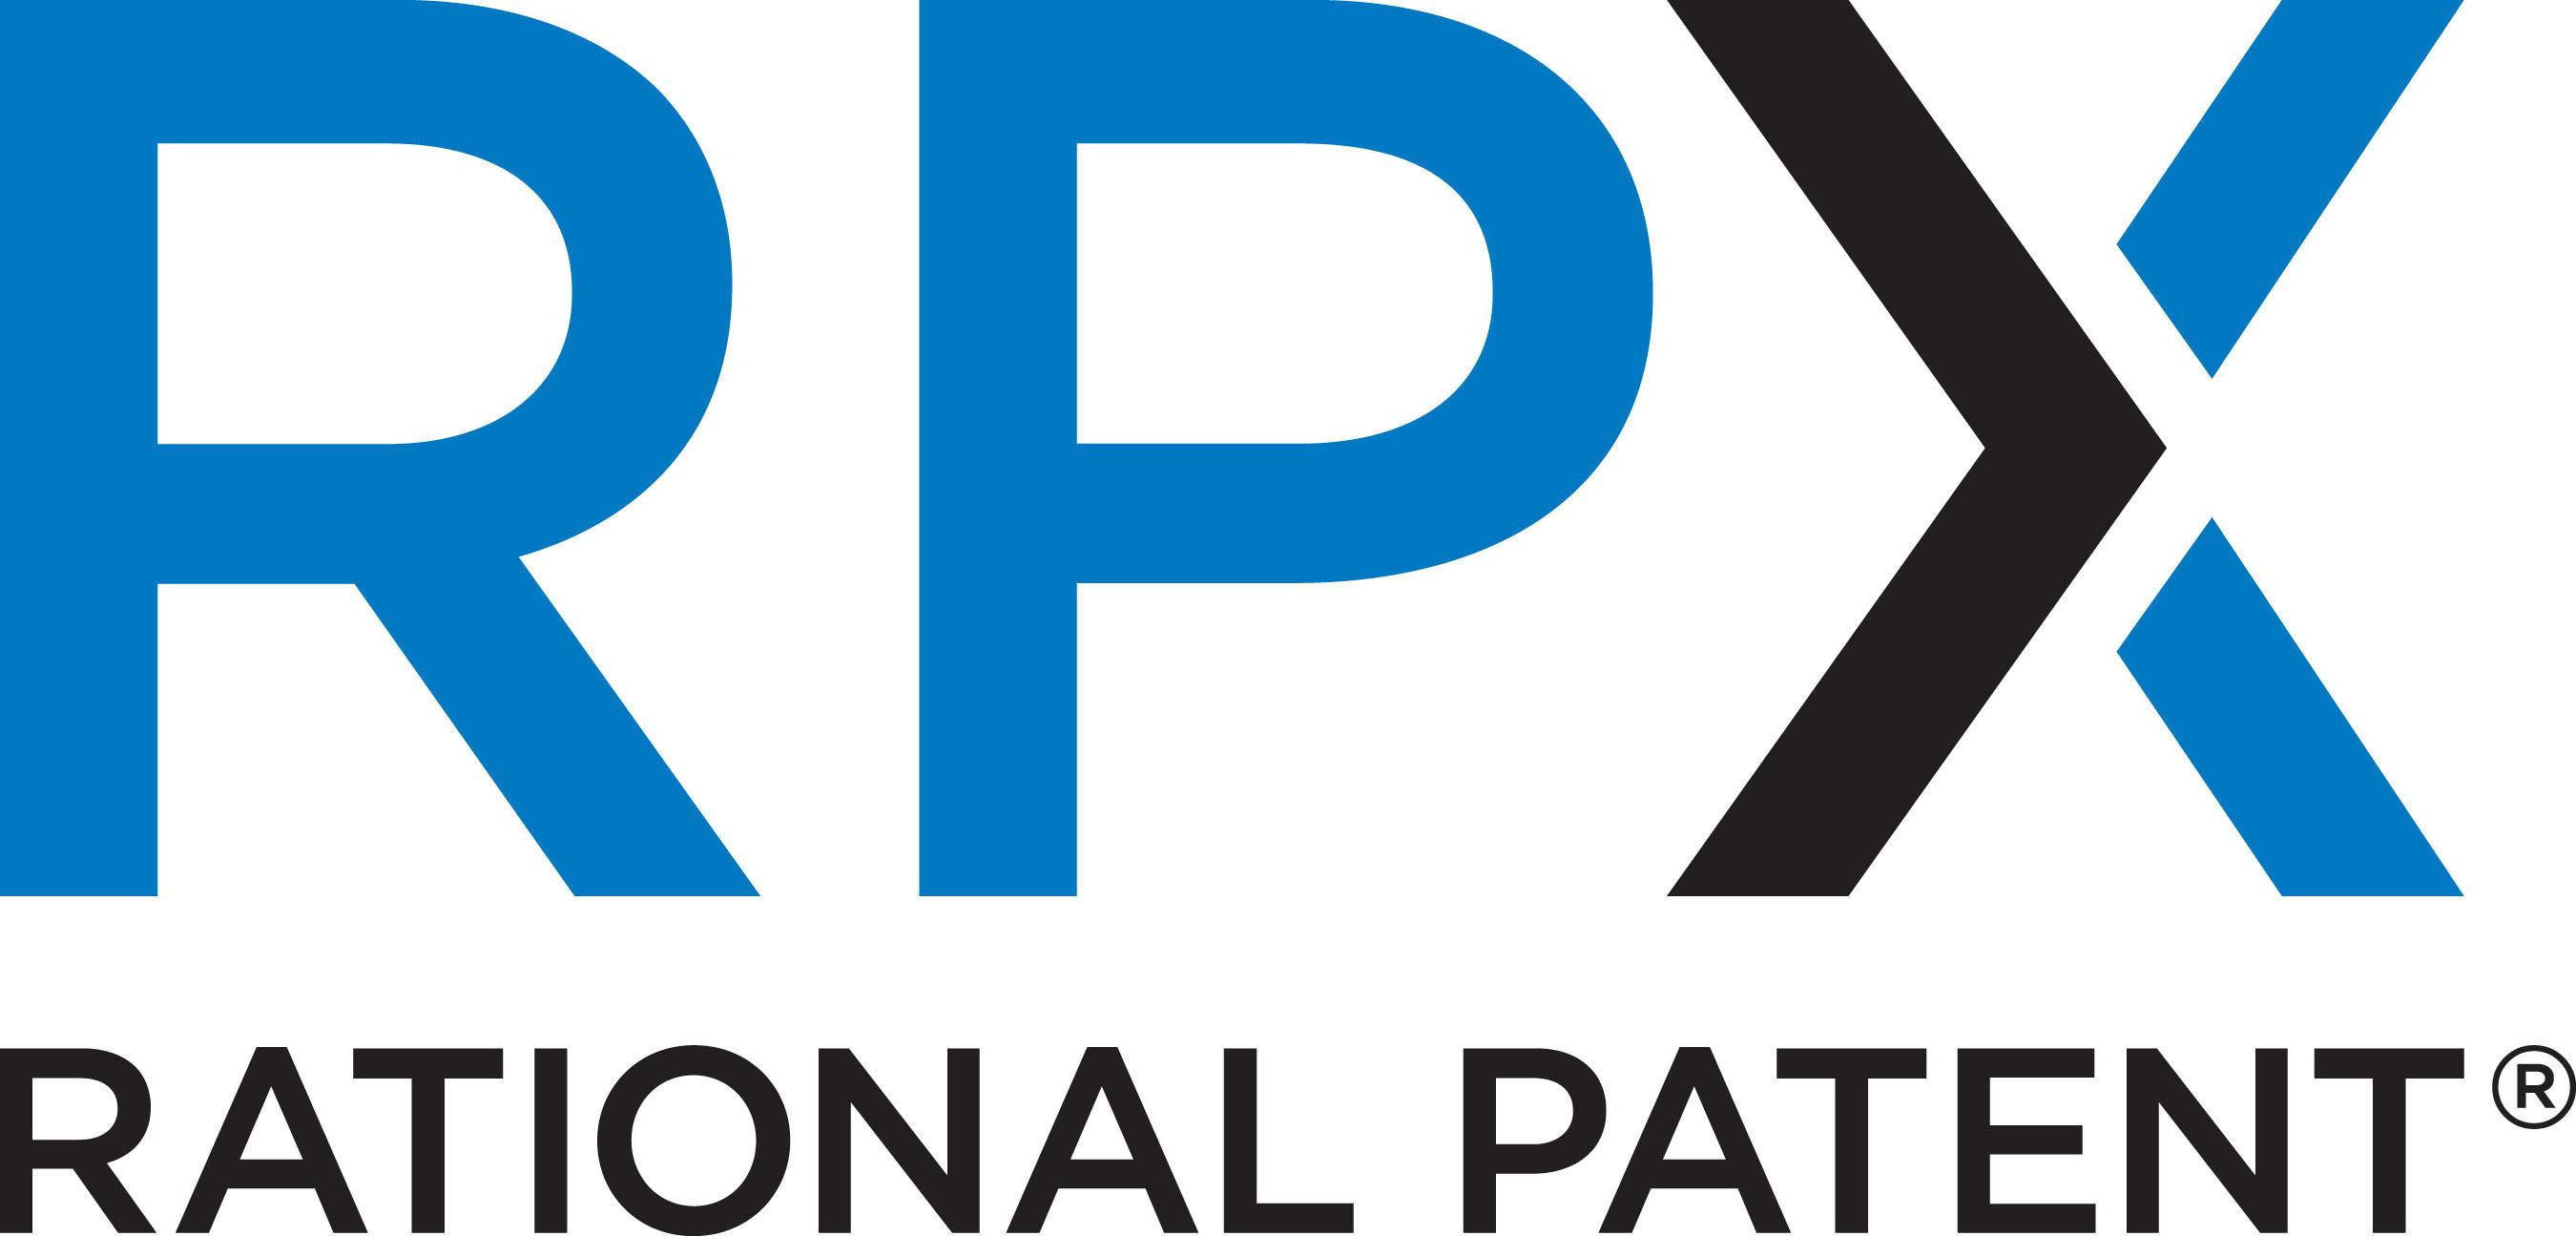 RPX Corporation Logo. (PRNewsFoto/RPX Corporation)